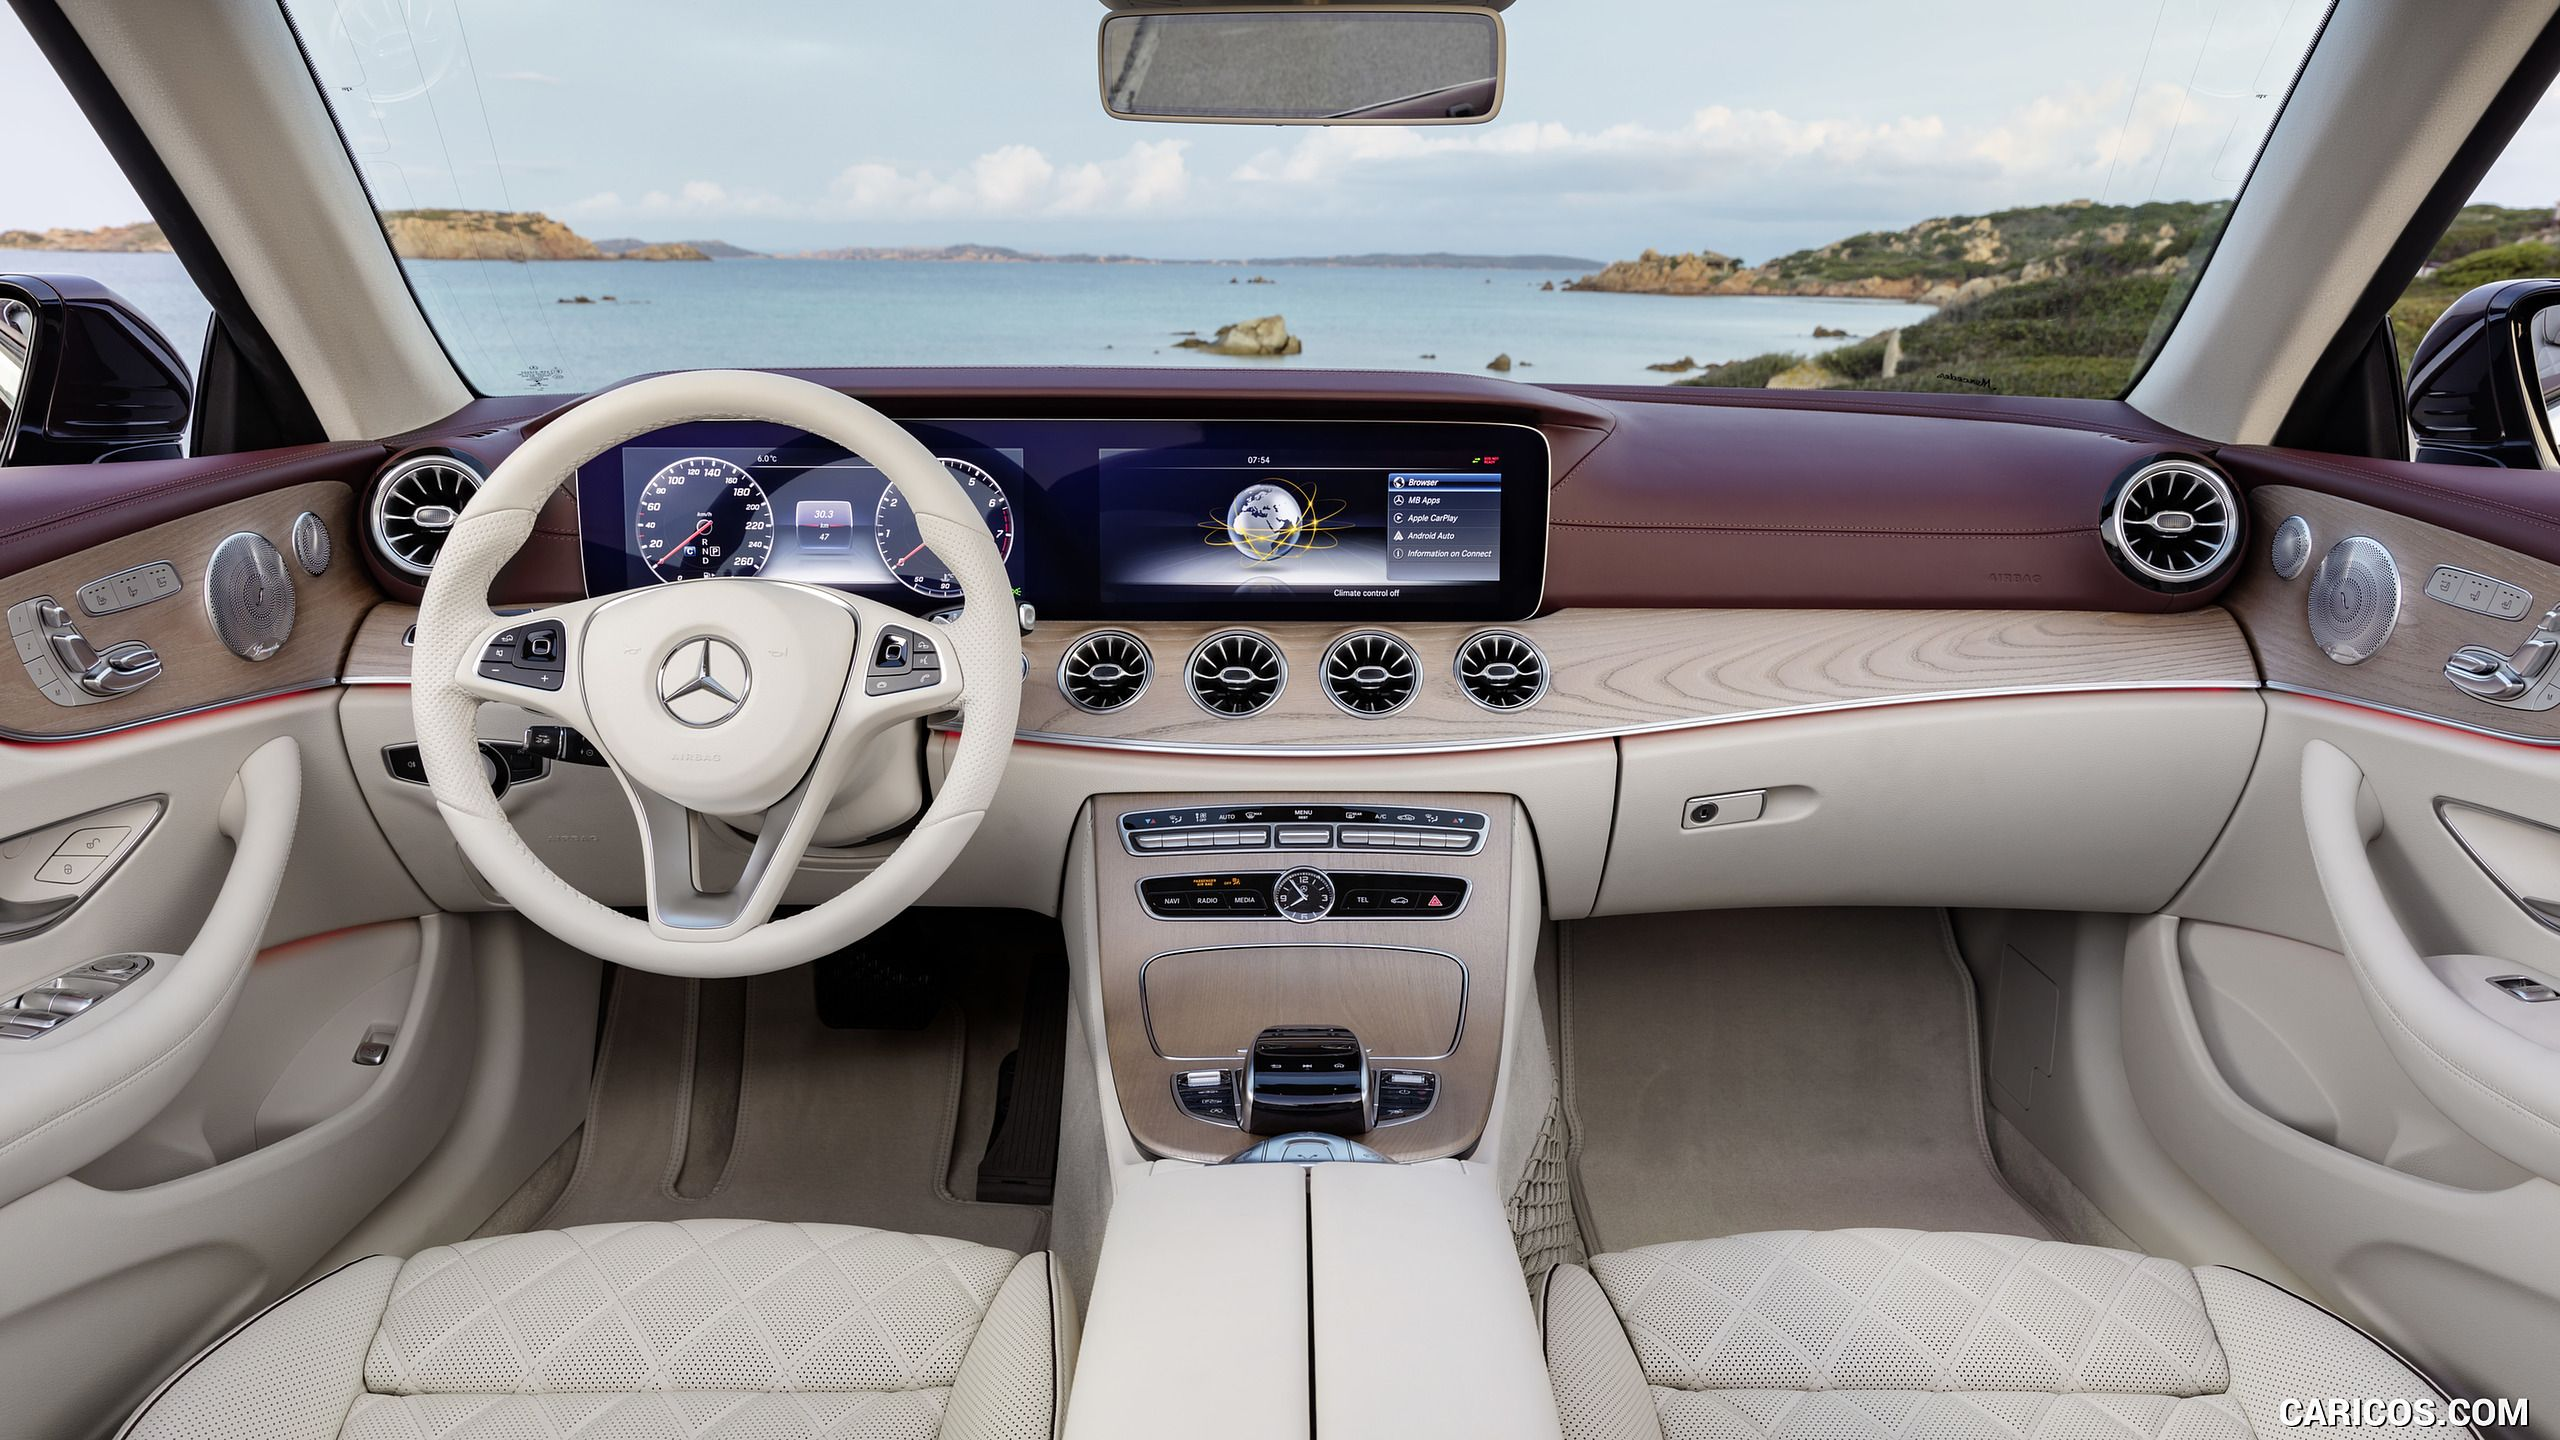 2018 Mercedes Benz E Class Cabrio Wallpaper With Images